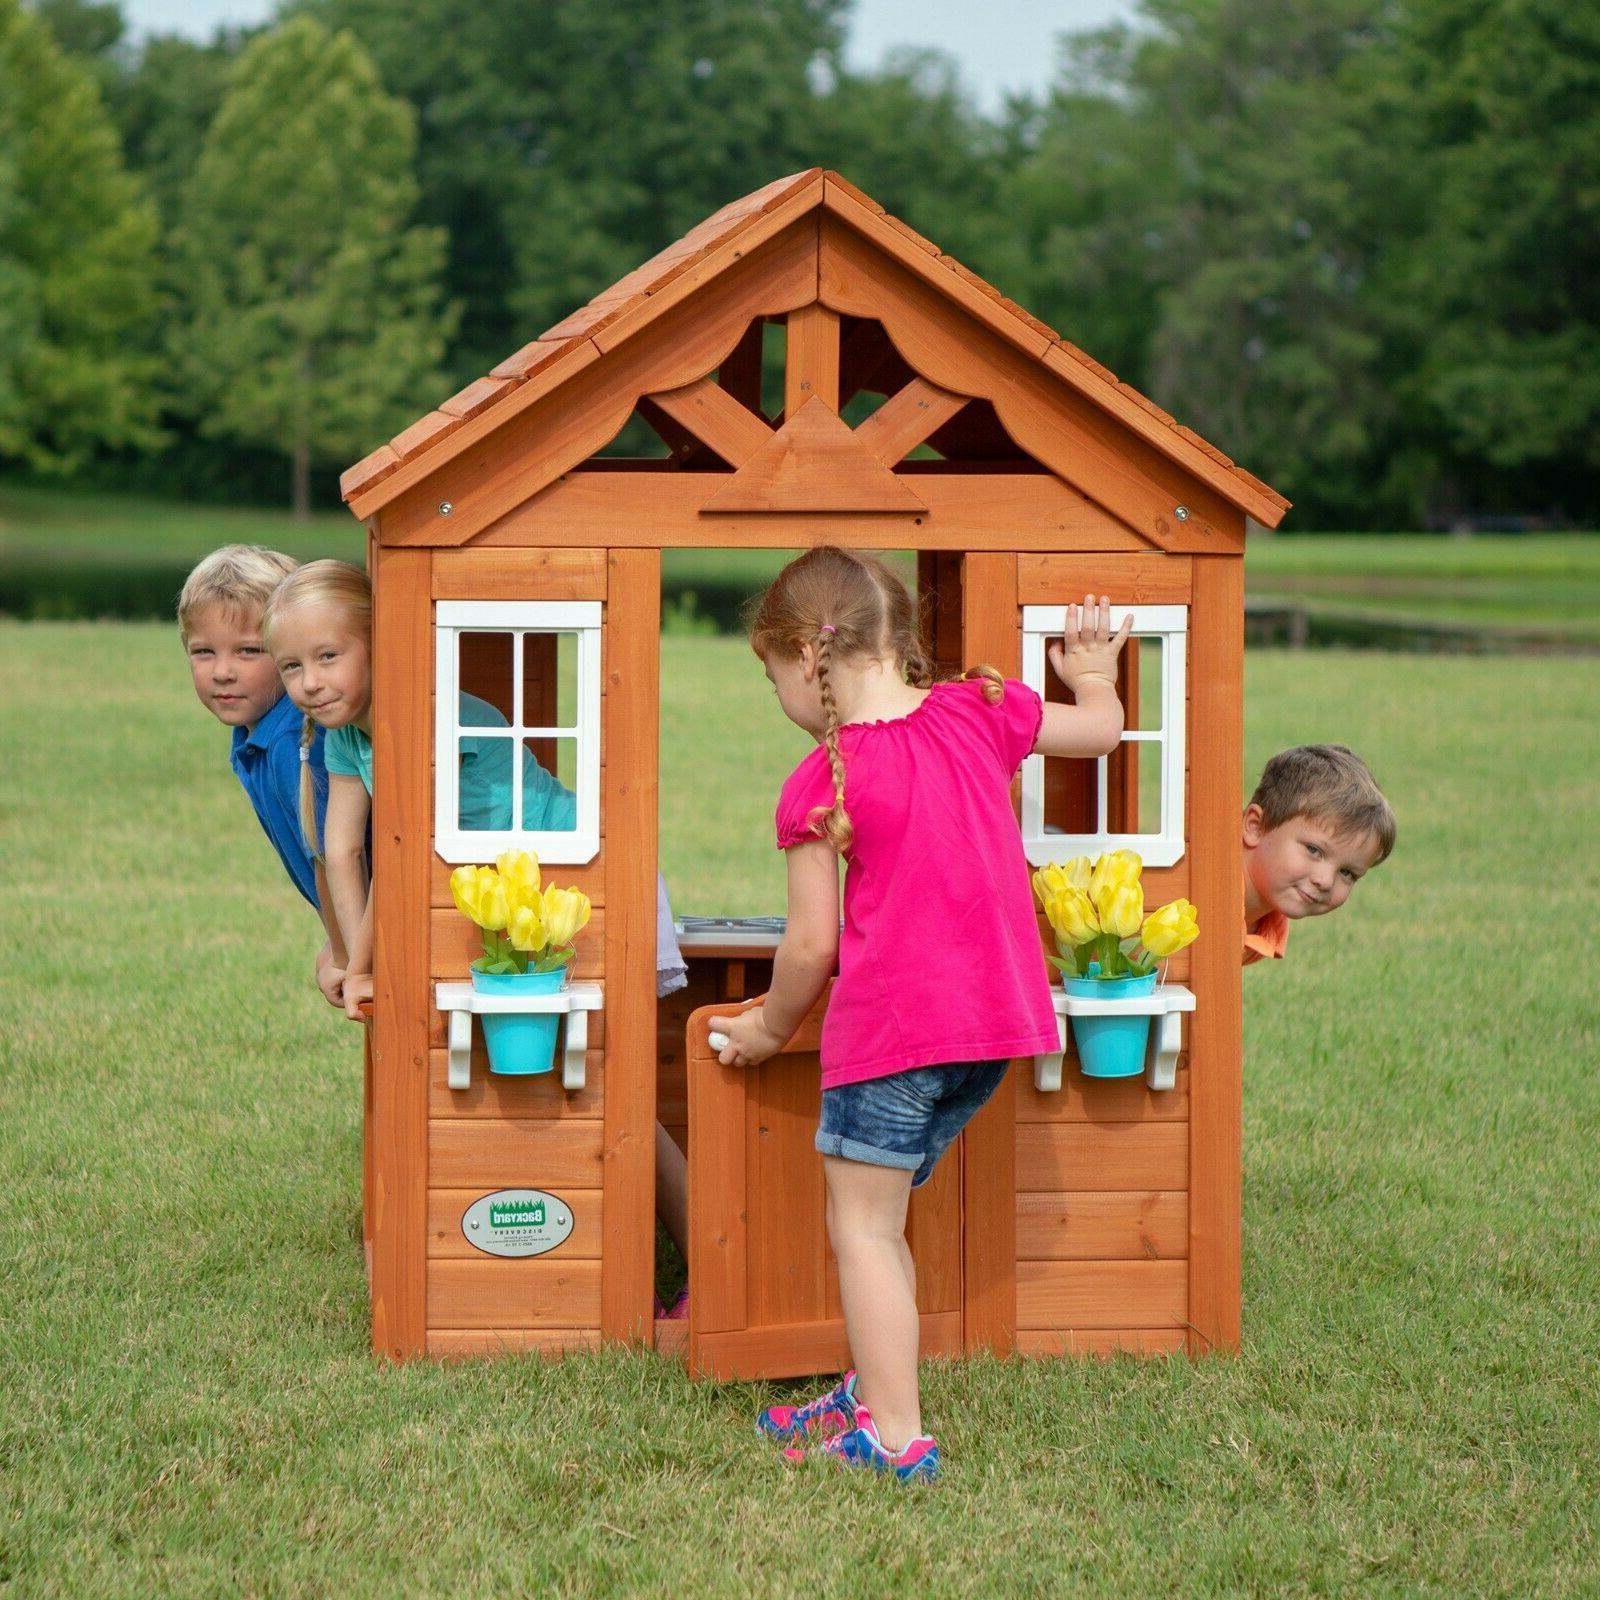 Backyard House Playset Kids Fun